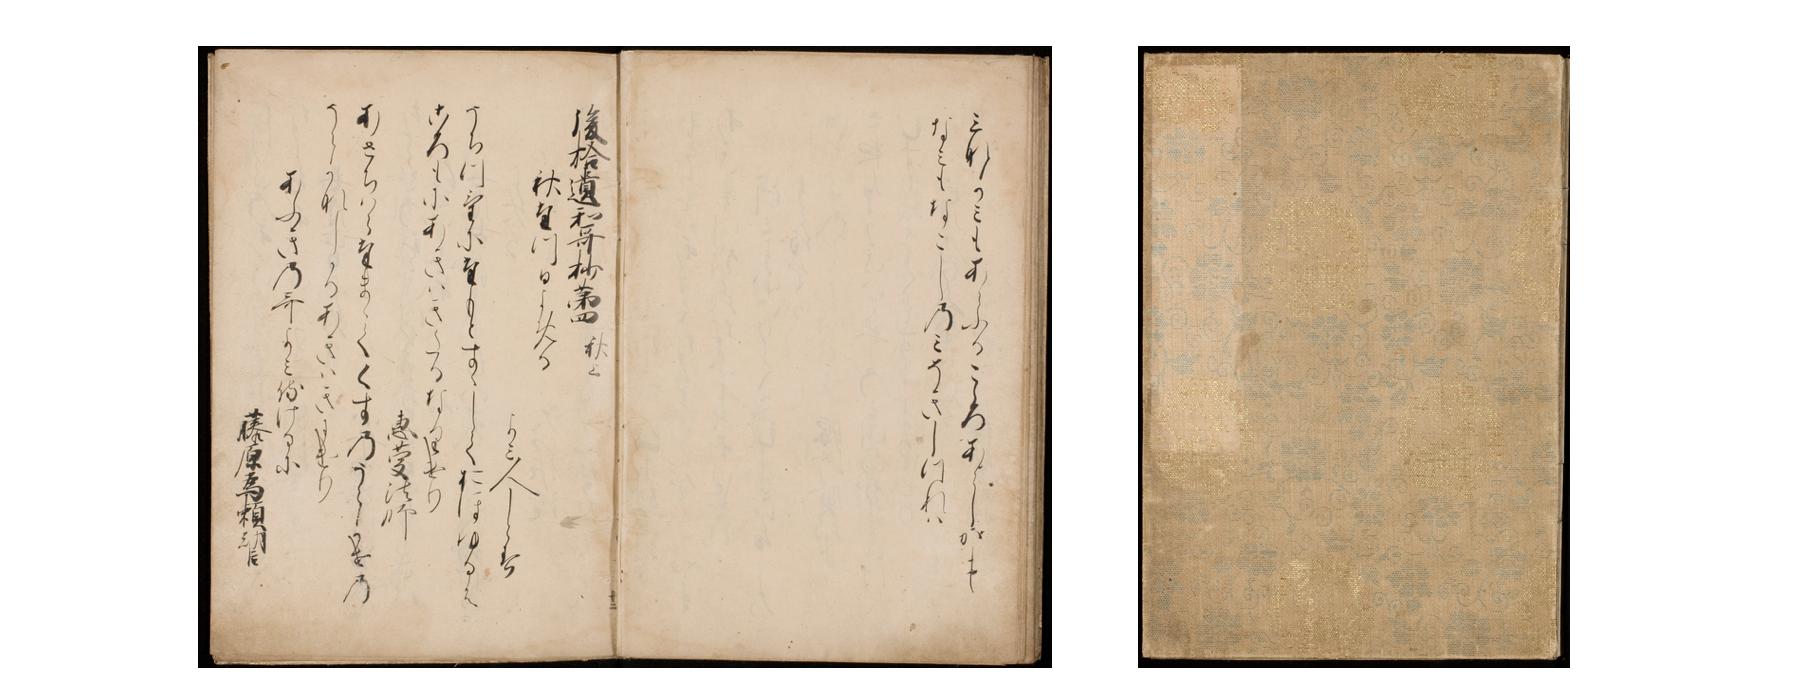 Goshūiwakashō